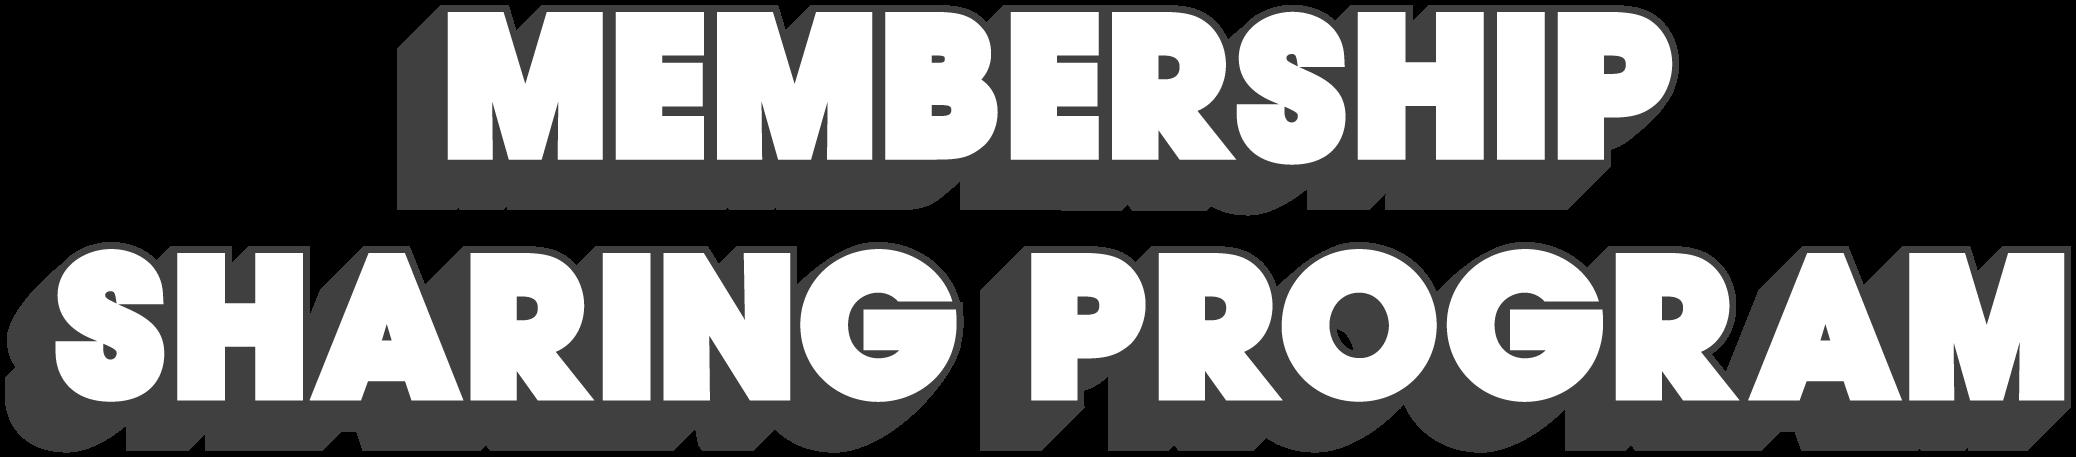 Membership Sharing Program